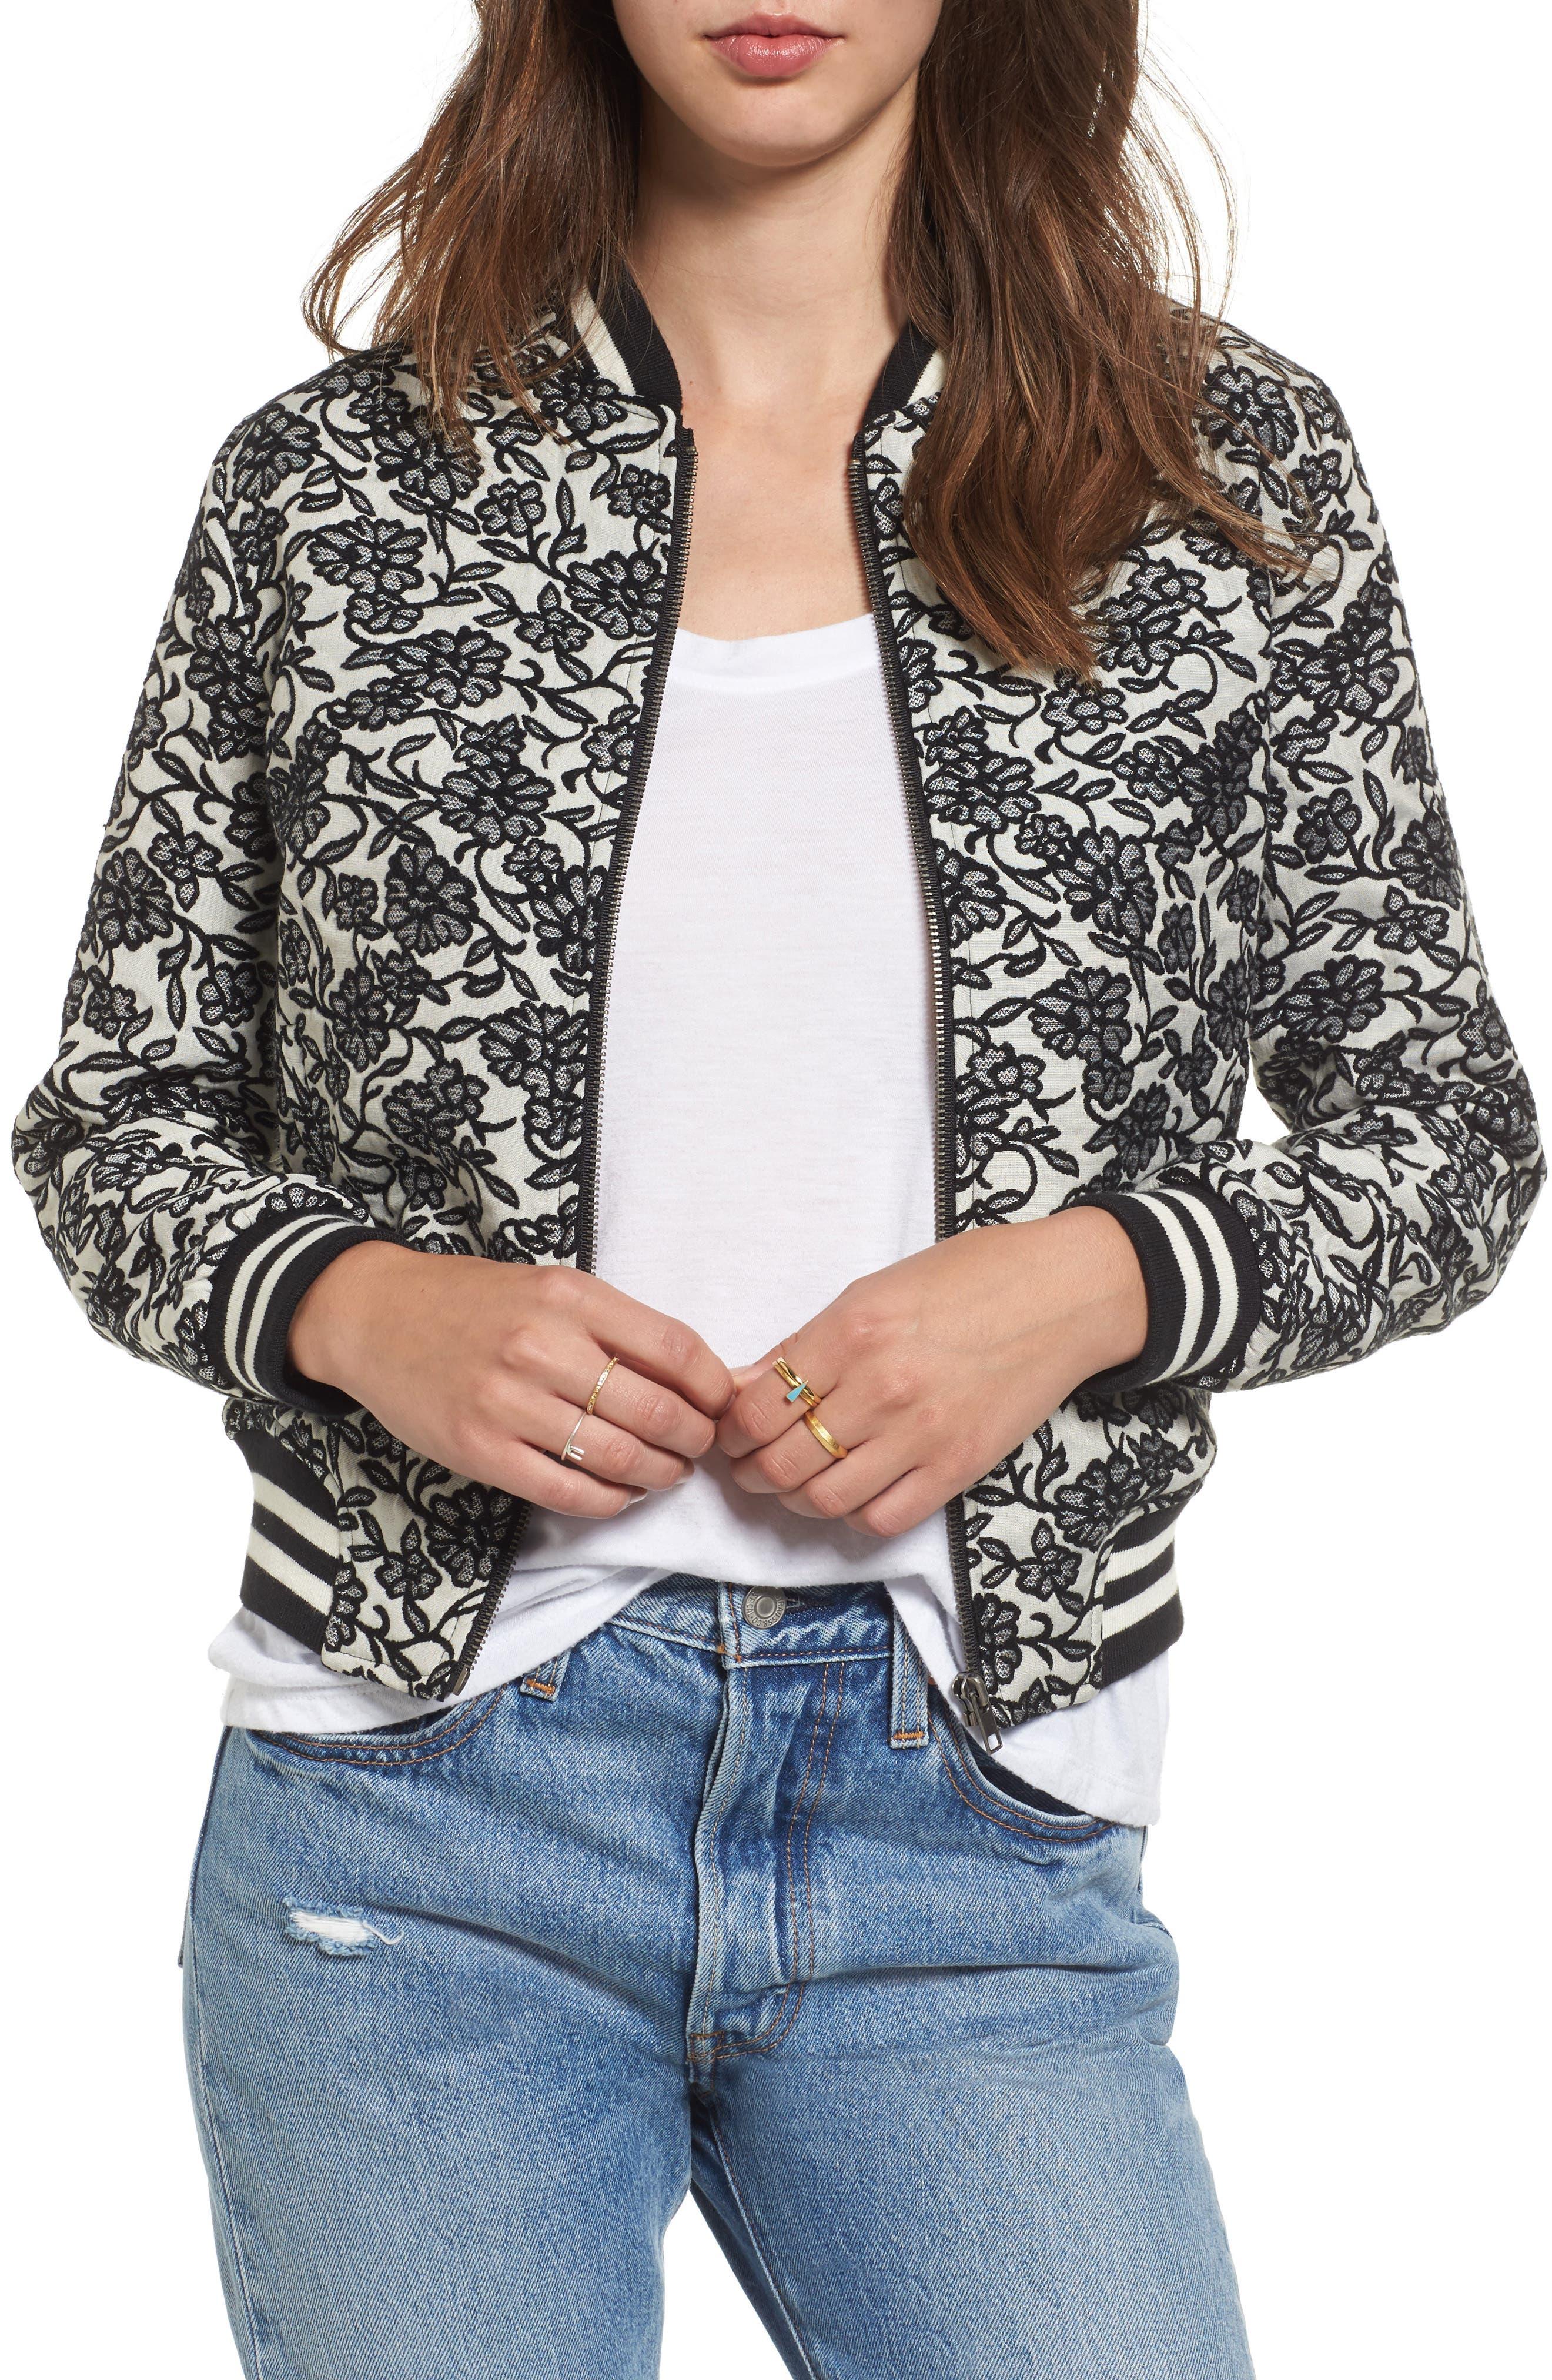 Alternate Image 1 Selected - BB Dakota Addie Floral Brocade Bomber Jacket